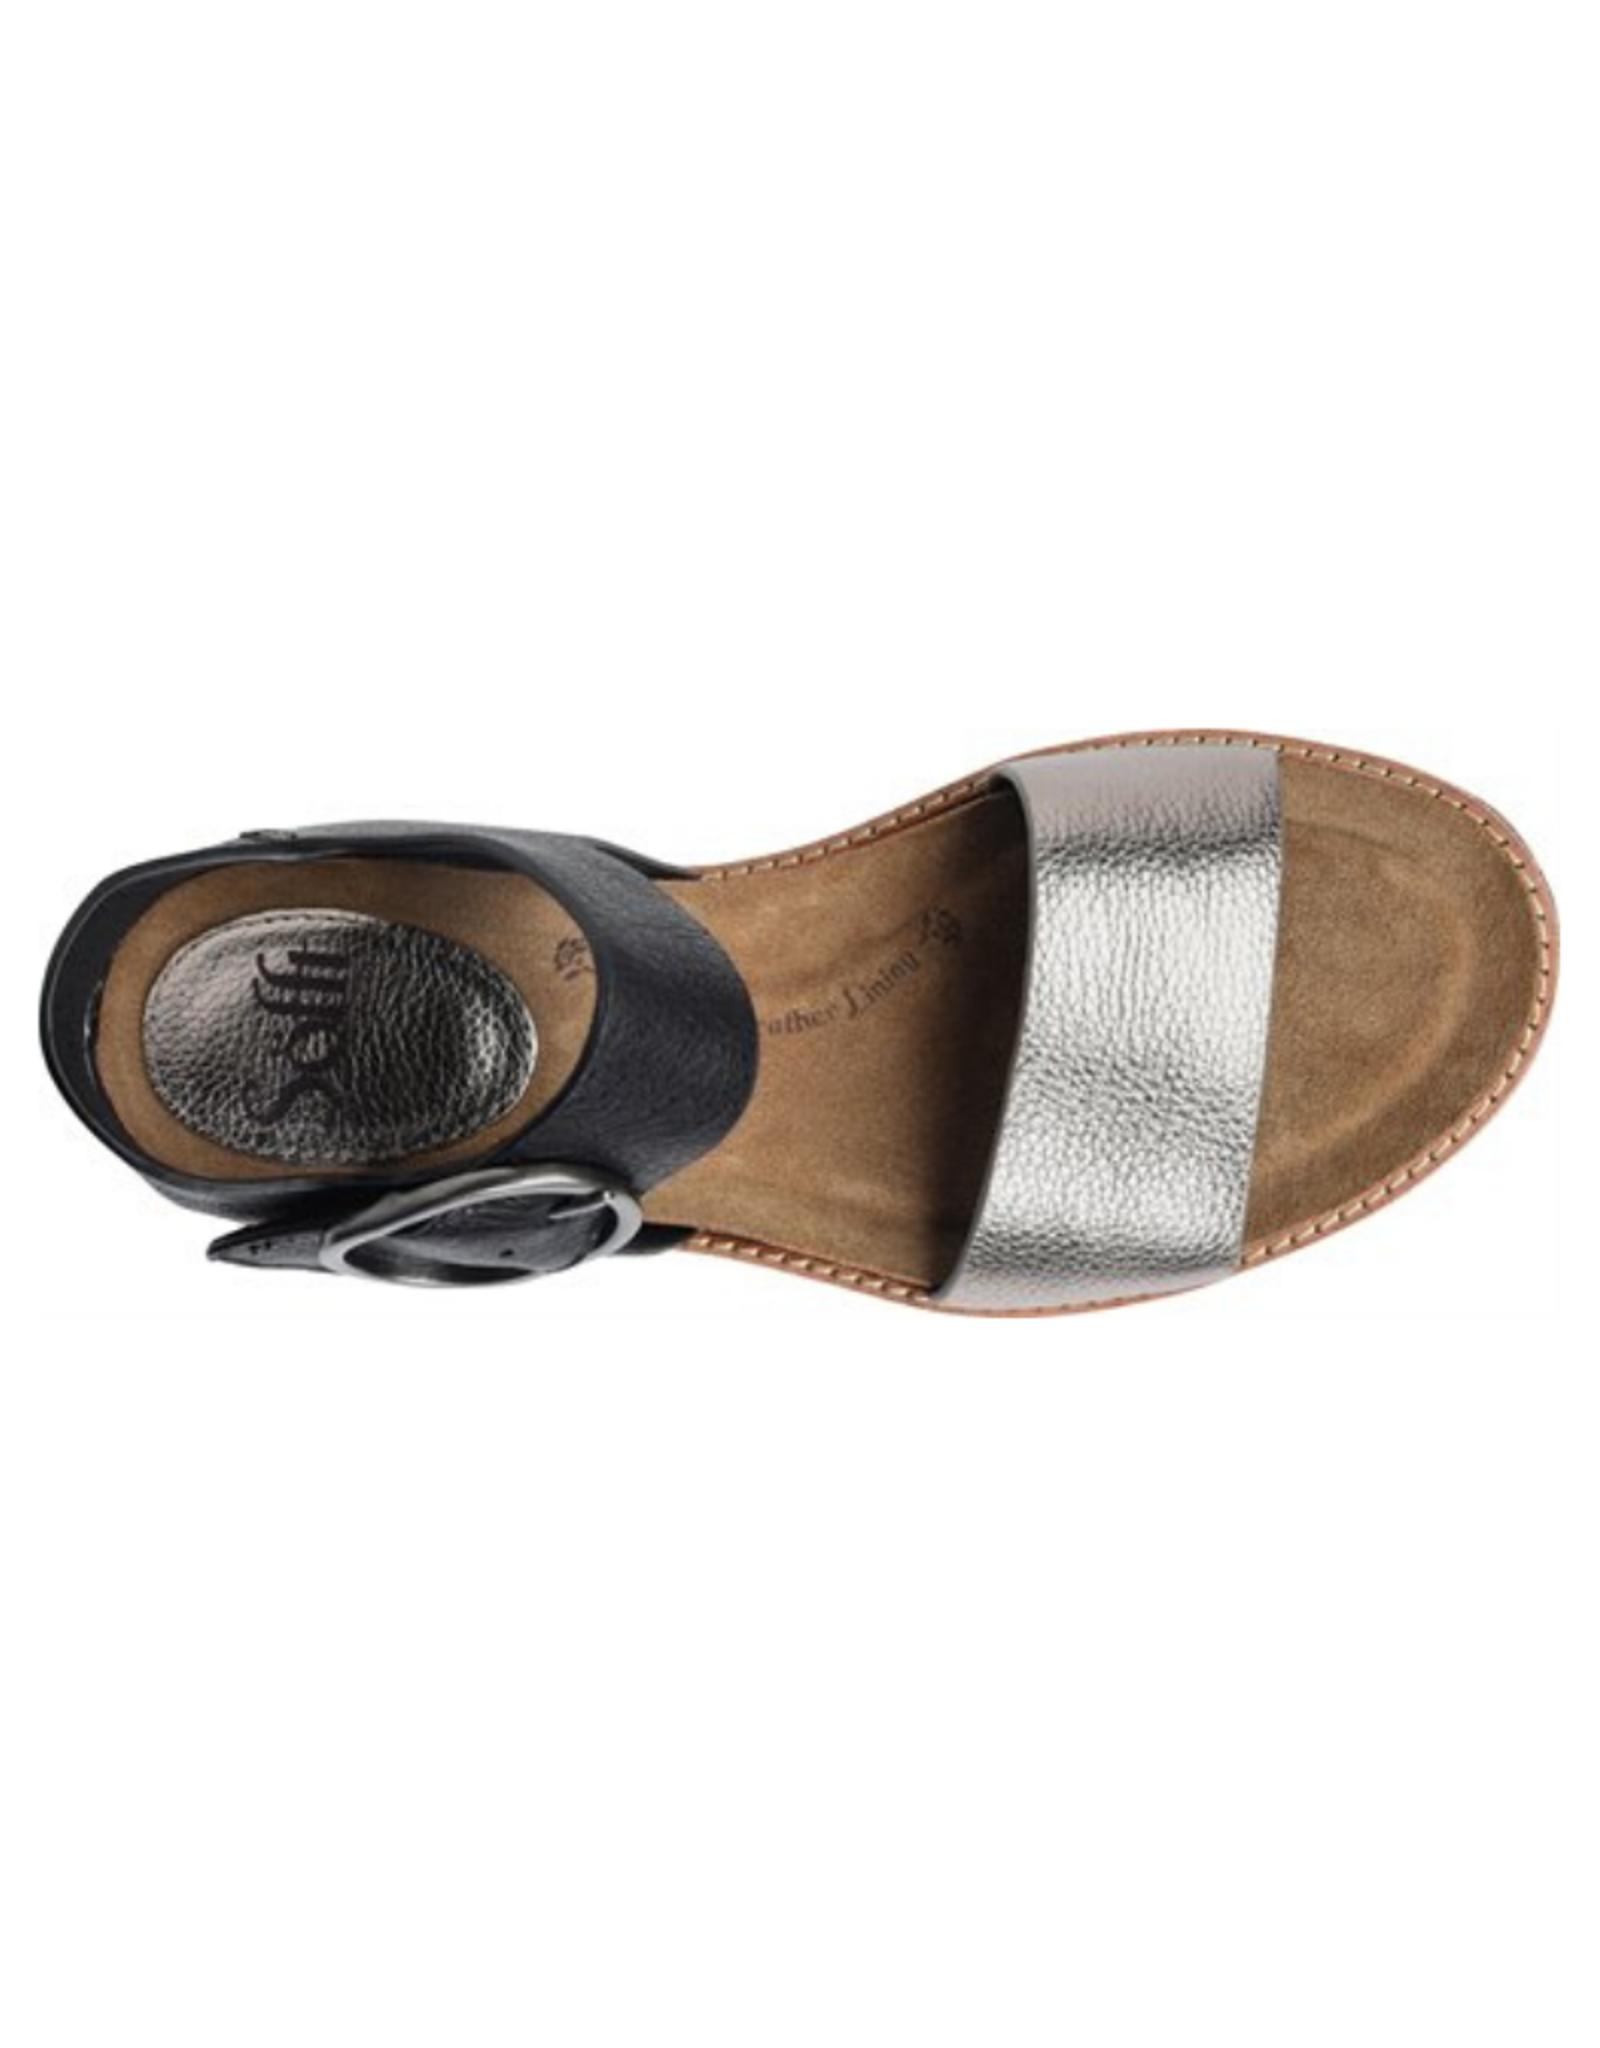 SOFFT Bali Sandal